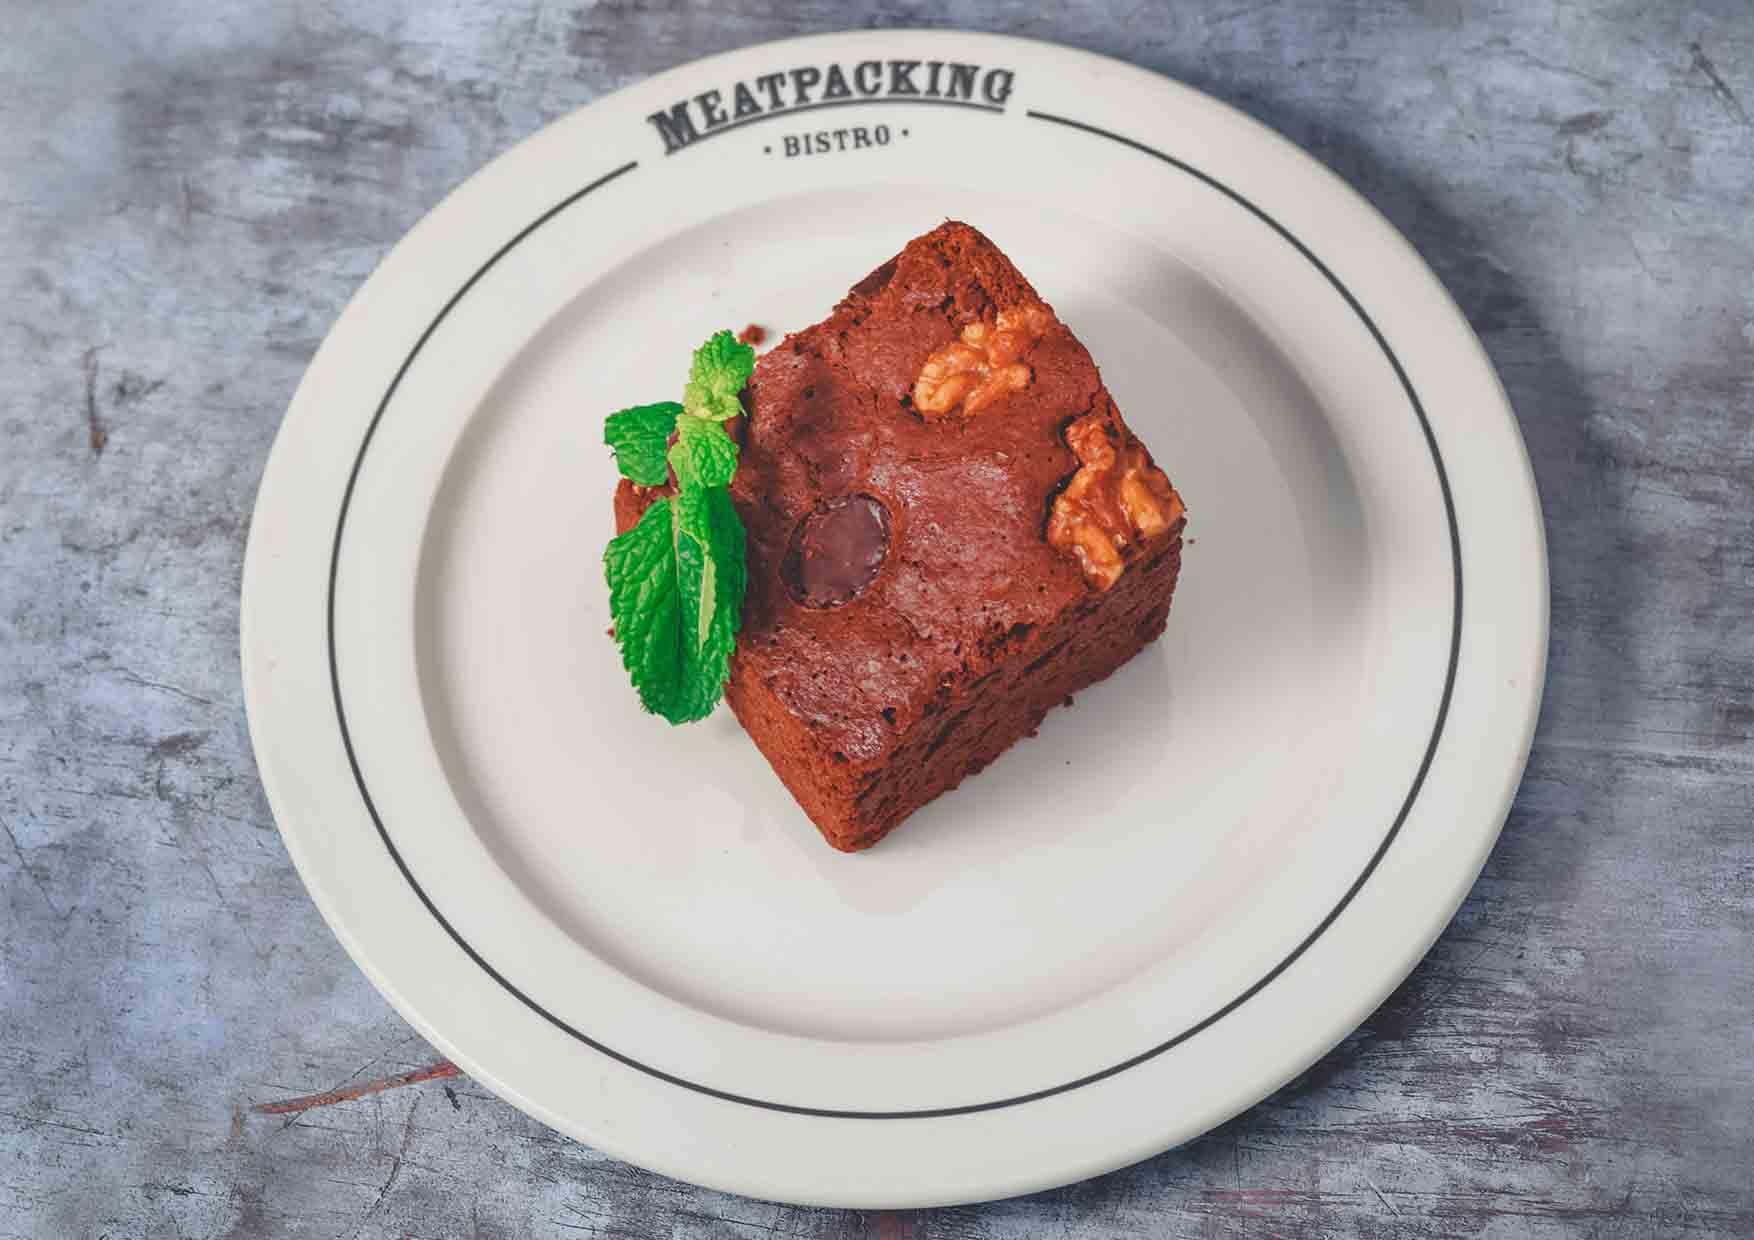 Brownie De Chocolate - postres barcelona - Meatpacking - restaurante a domicilio barcelona